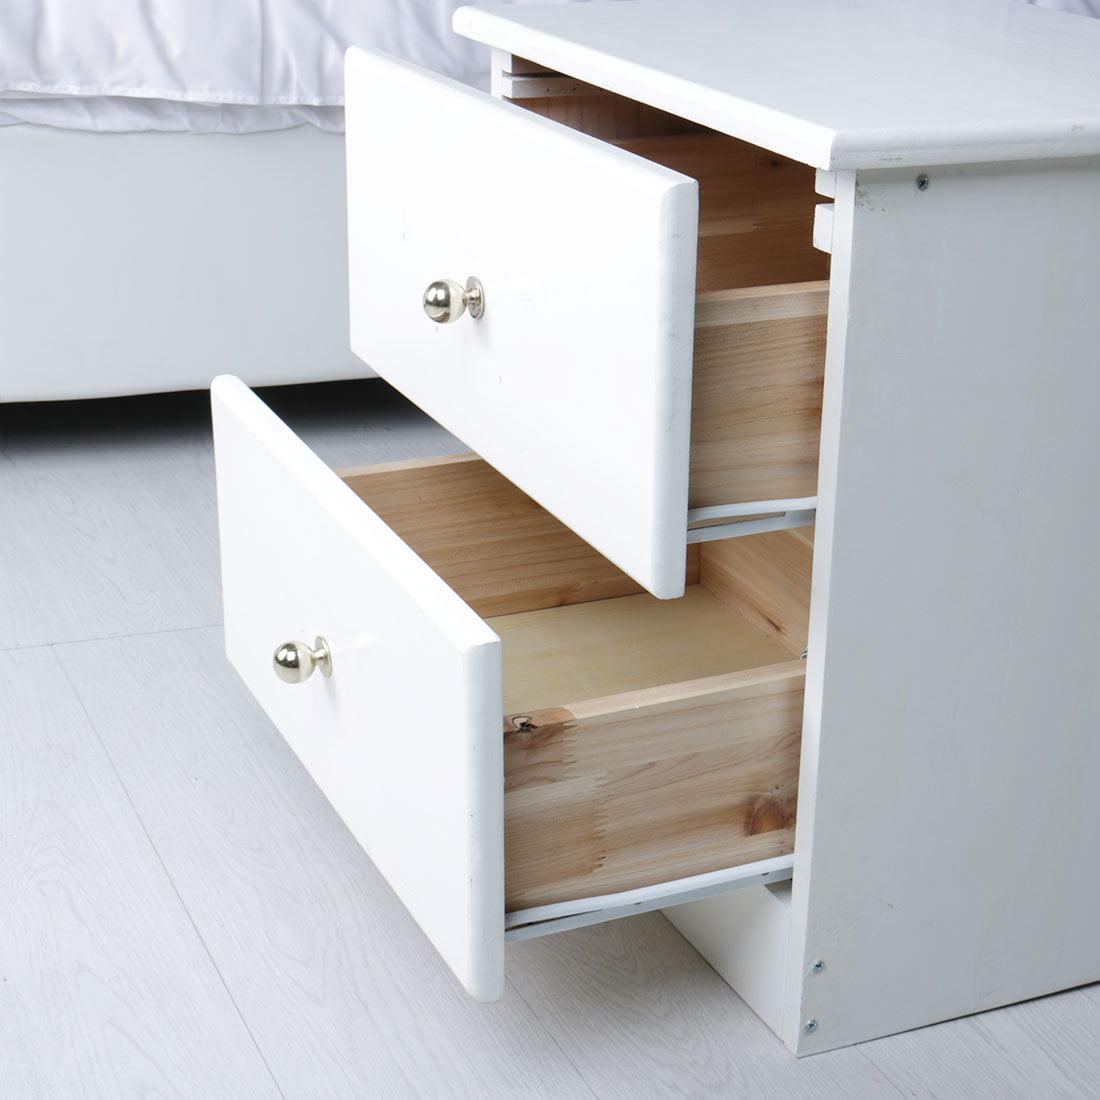 25mm*30mm Crystal+Zinc Alloy Cupboard Cabinet Furniture Handle Knobs Hardware